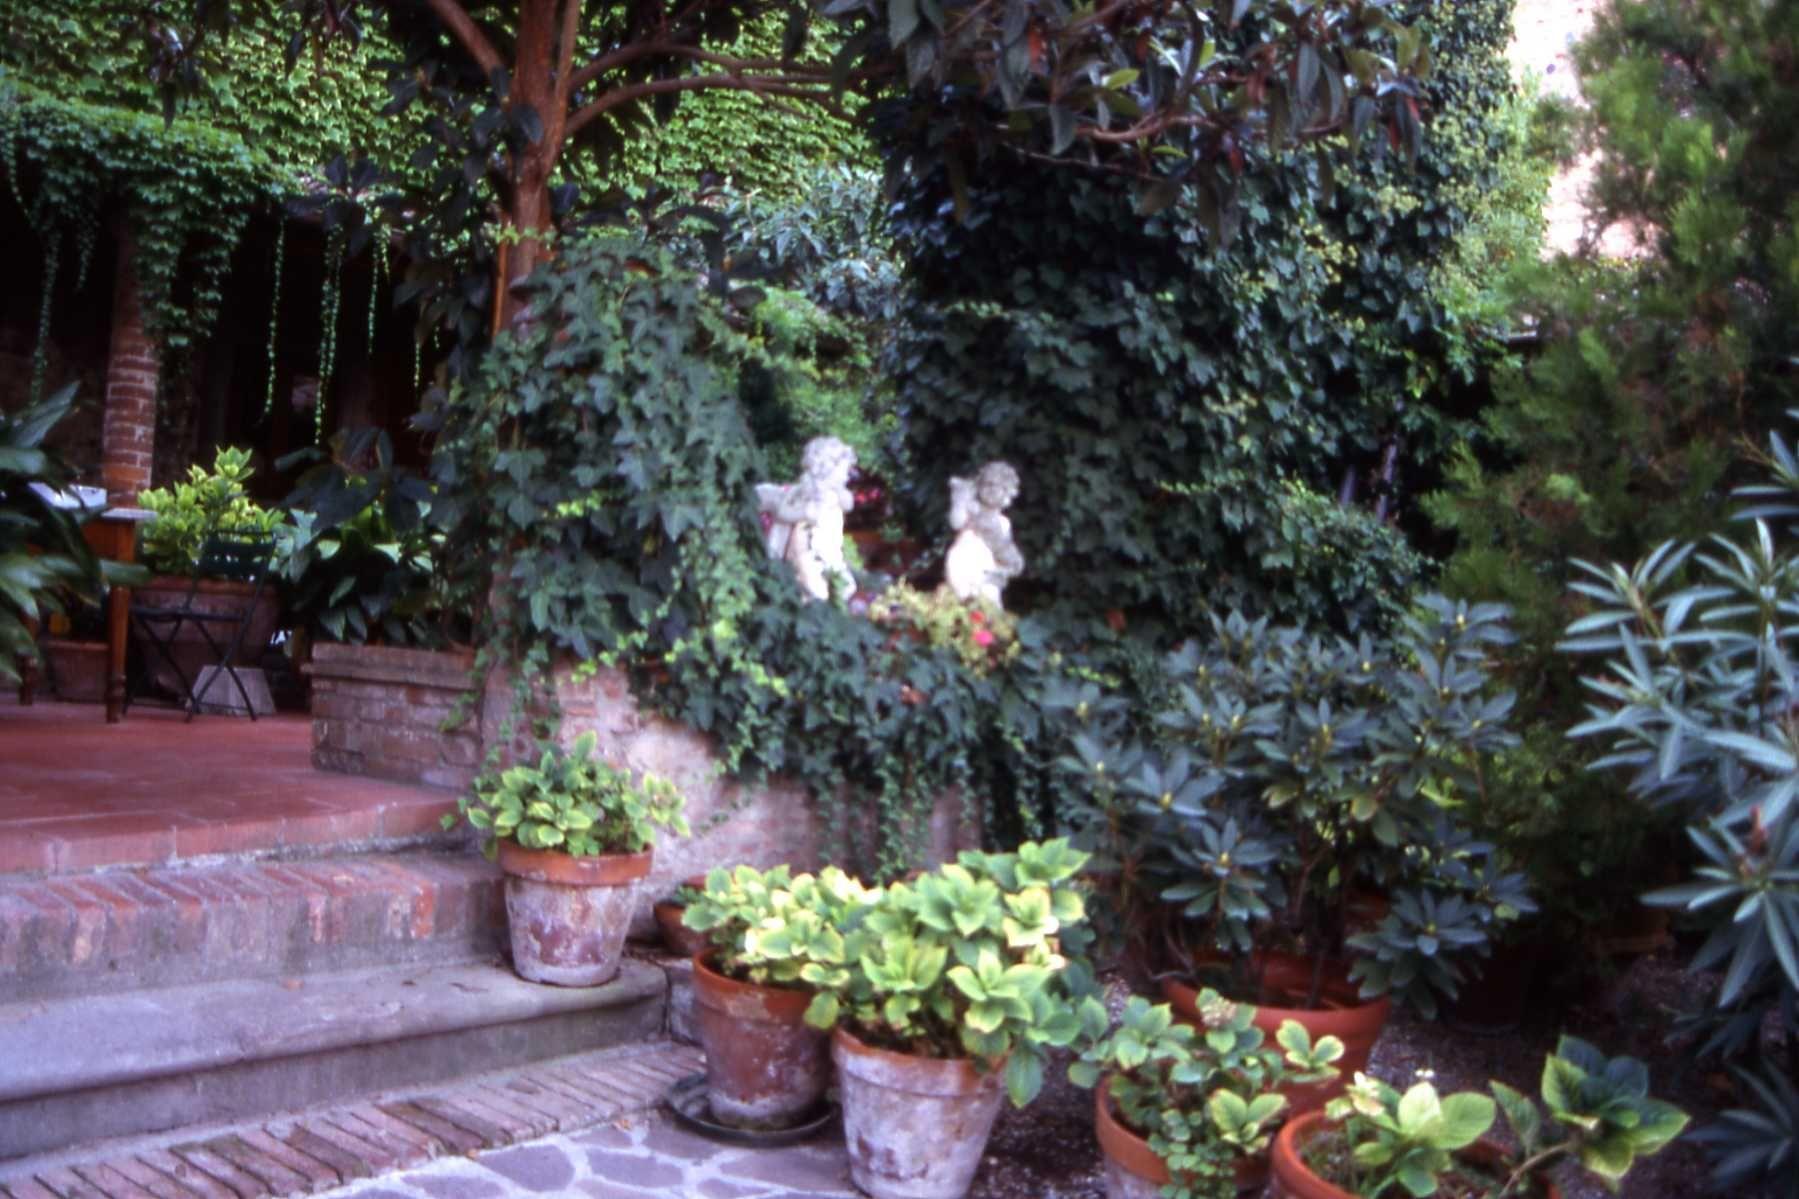 restaurant gardens in certaldo alto, italy   memories